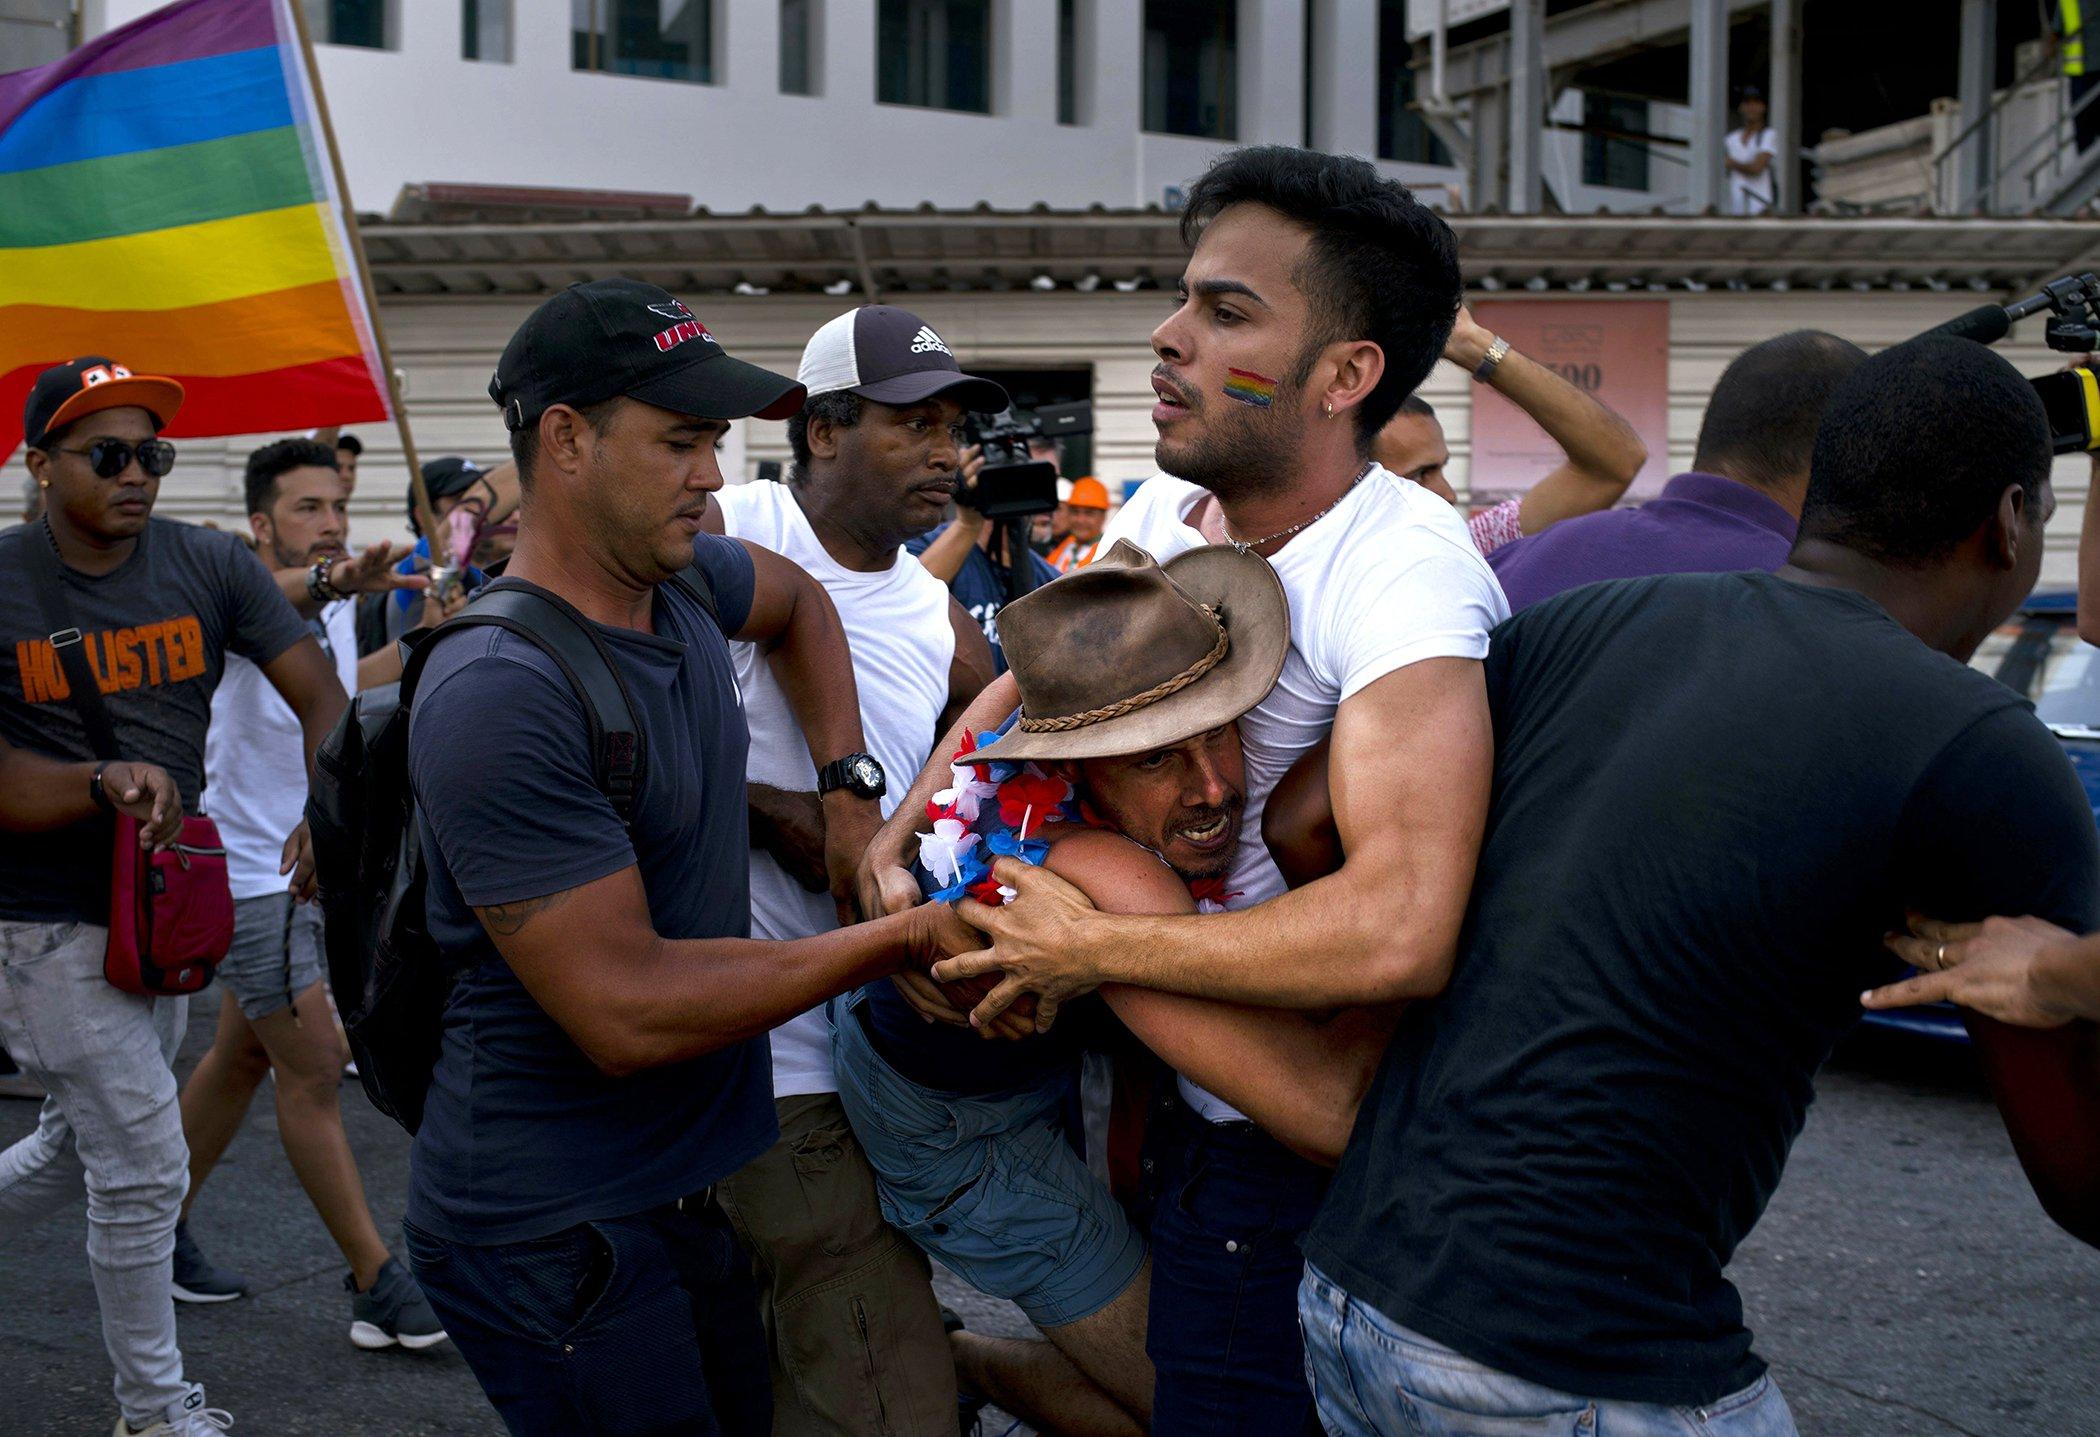 Cuba-LGBT-Crackdown-Pride-March.jpg